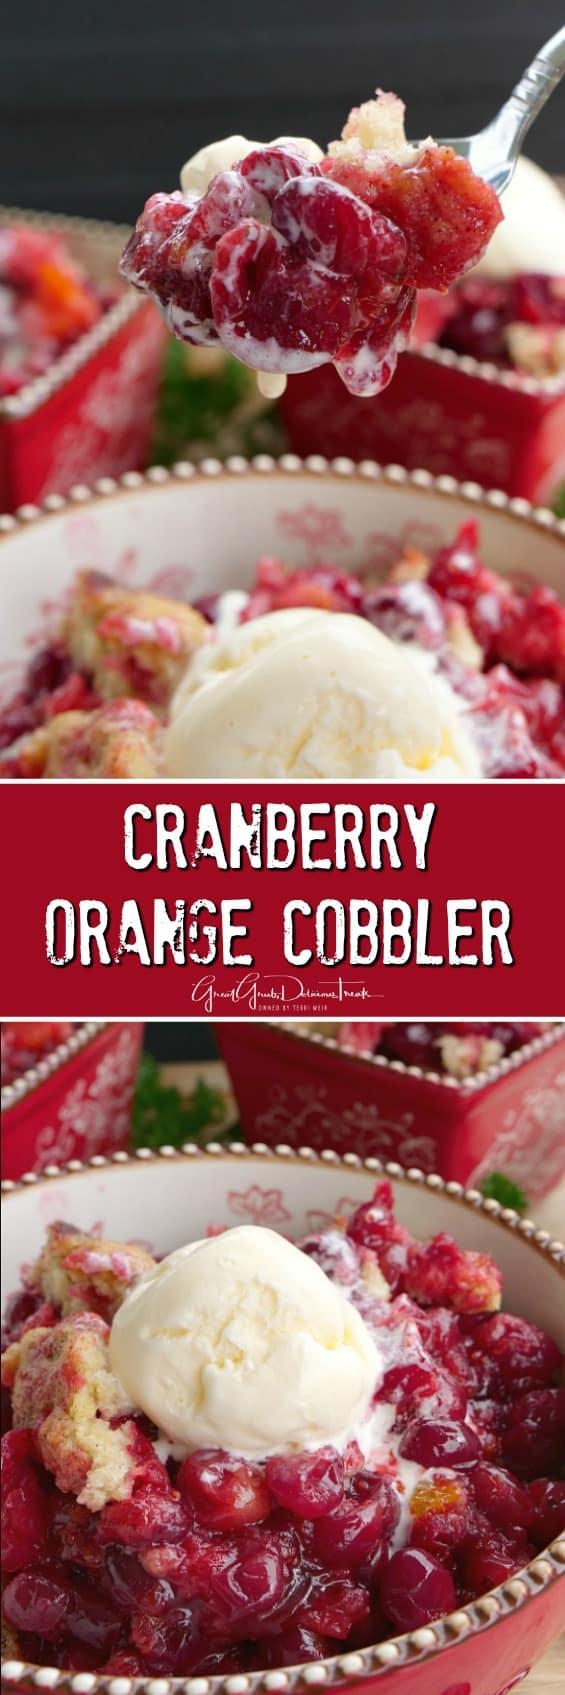 Cranberry Orange Cobbler